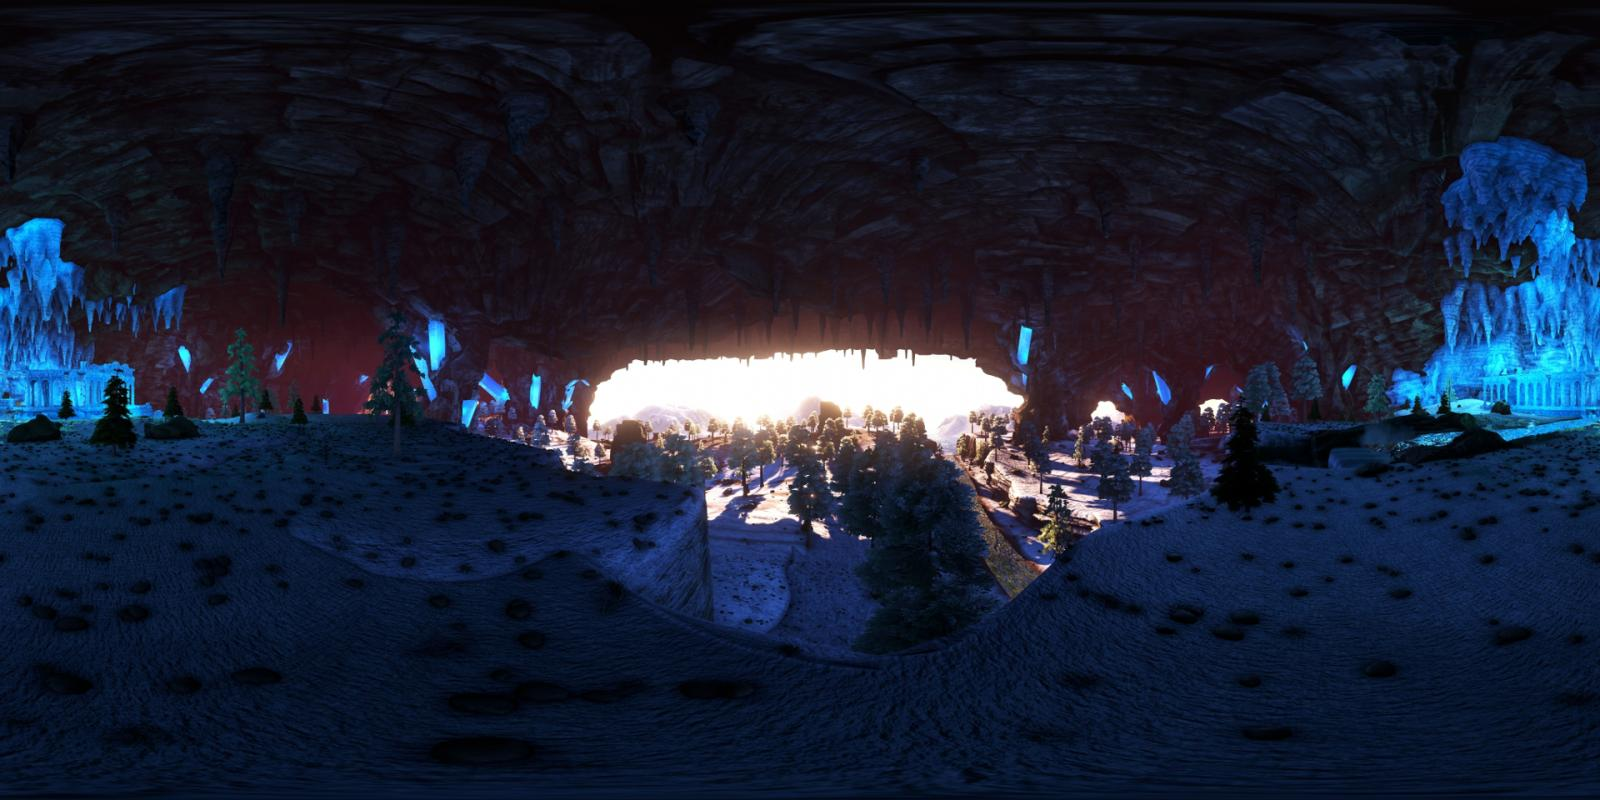 large.5882e6c768379_FataL1ty-Asylum-Panoramic360Stereoscopic3Dsta.jpg